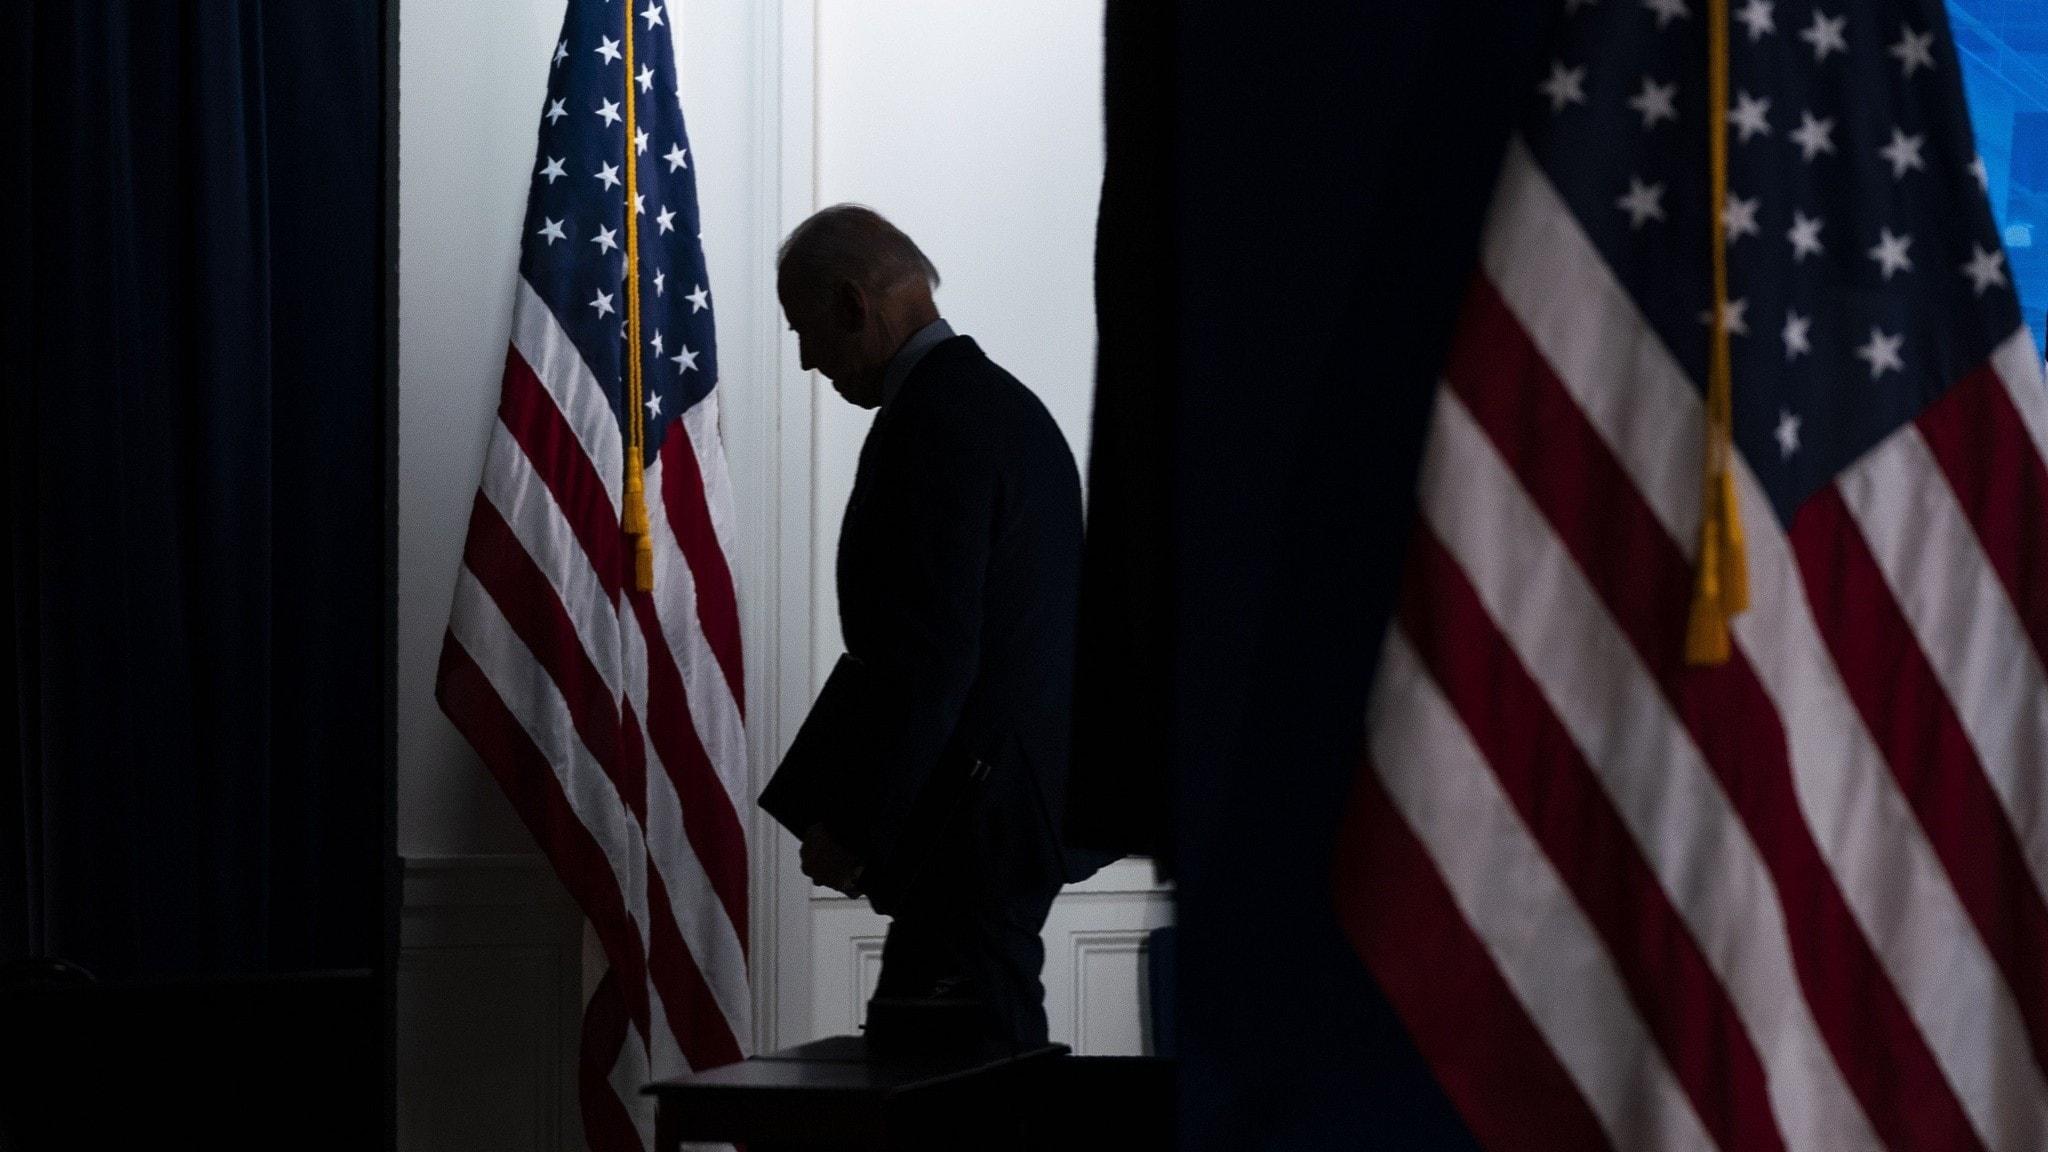 USAs president Joe Biden